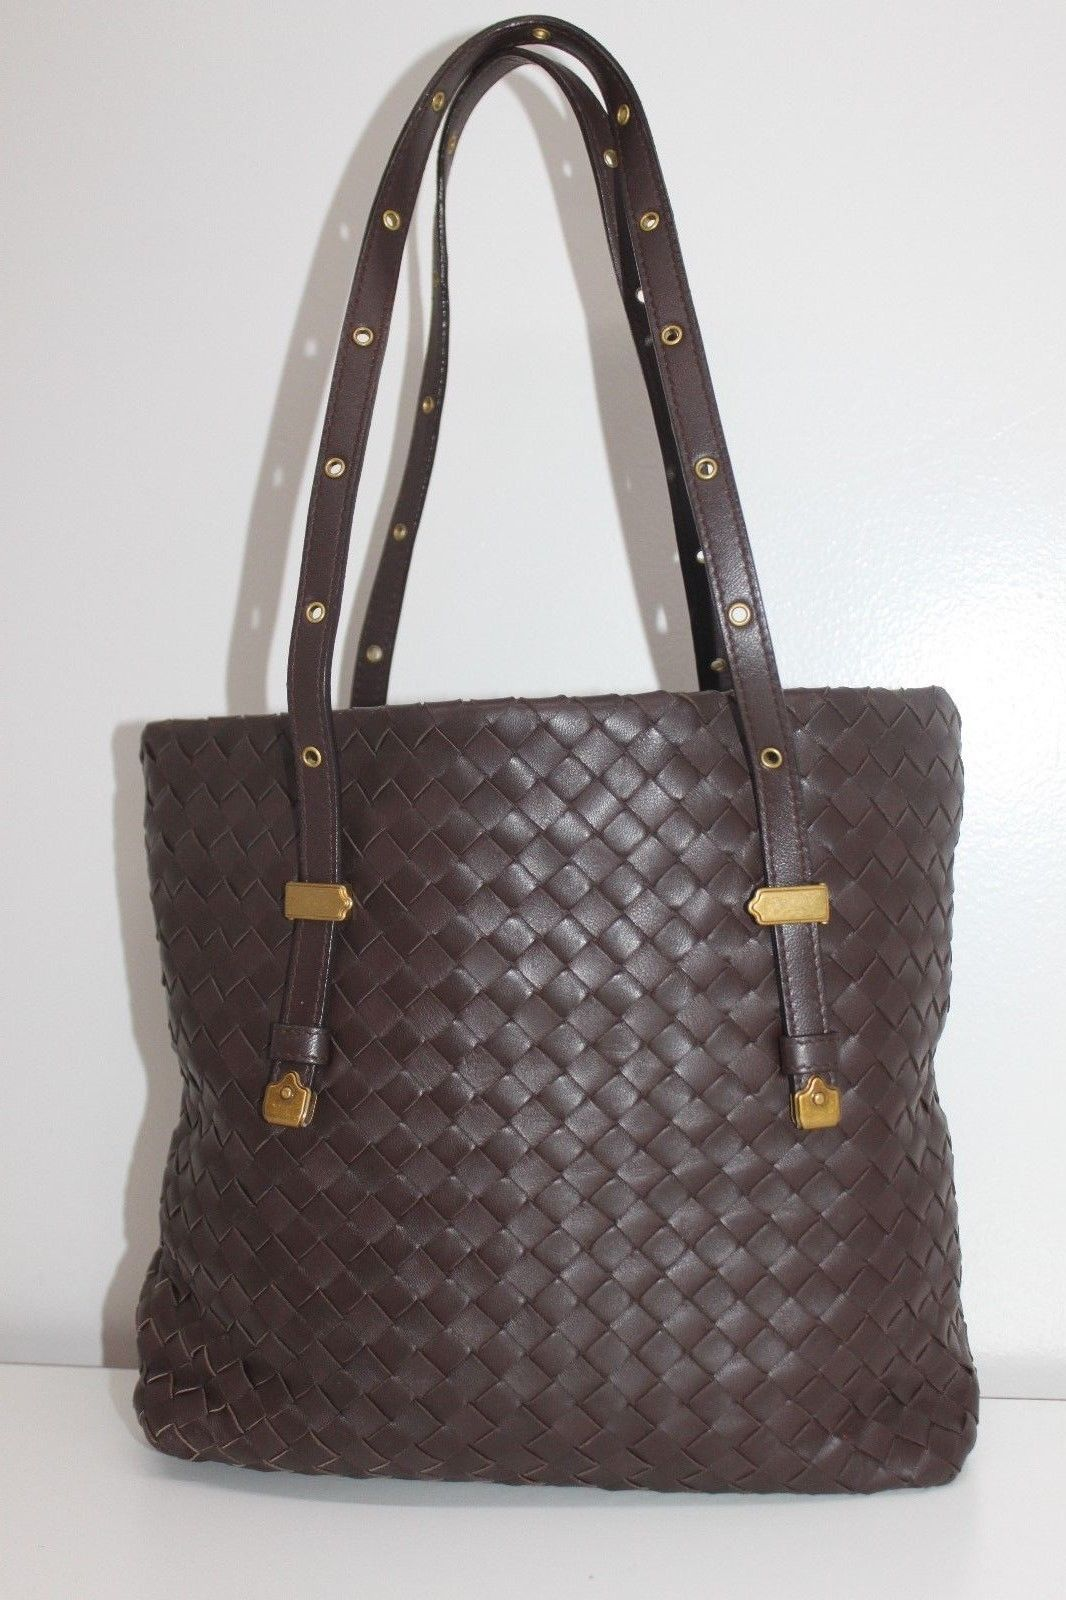 Details about AUTHENTIC BOTTEGA VENETA Intrecciato Leather Tote Bag ... fd0cb2c93bfbe